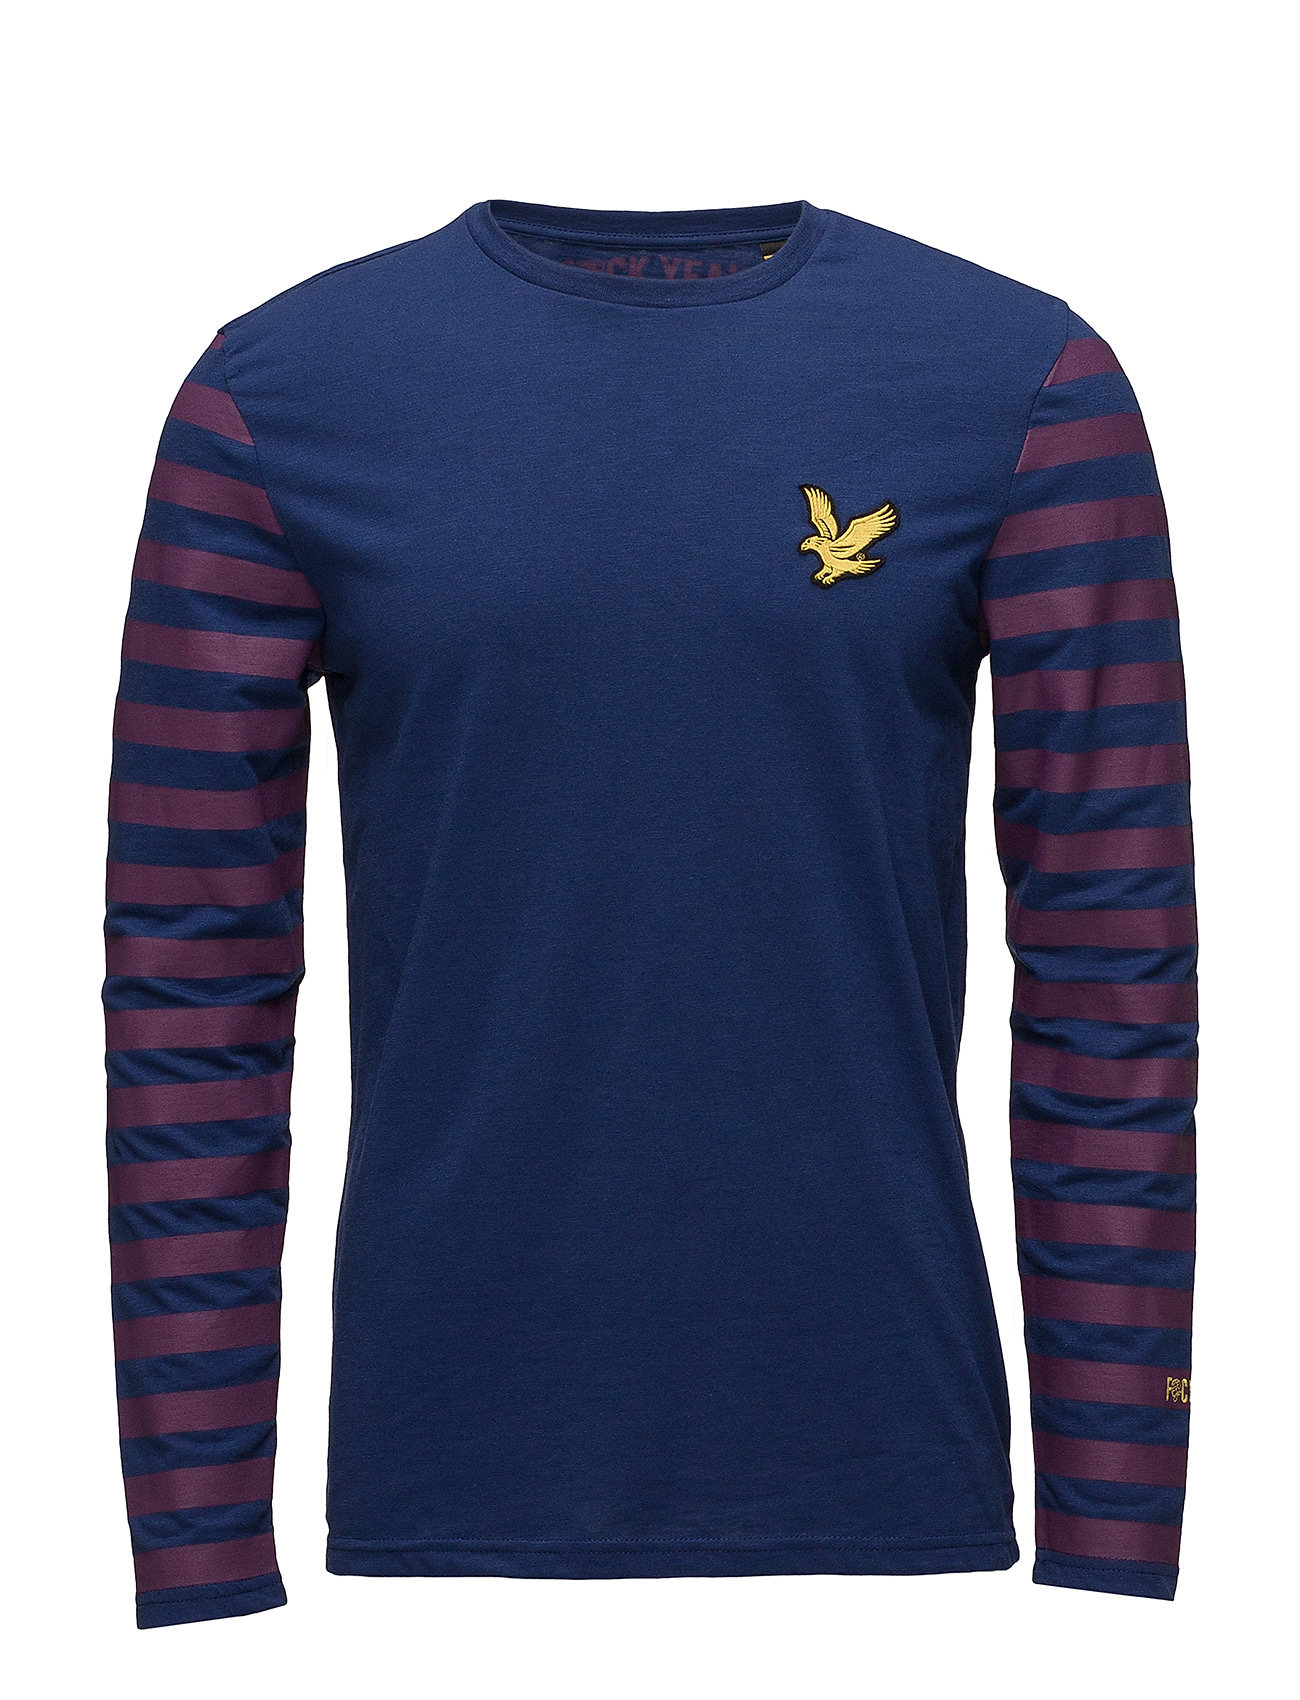 Lyle & Scott Sport Attaquer LS T Shirt Ögrönlar